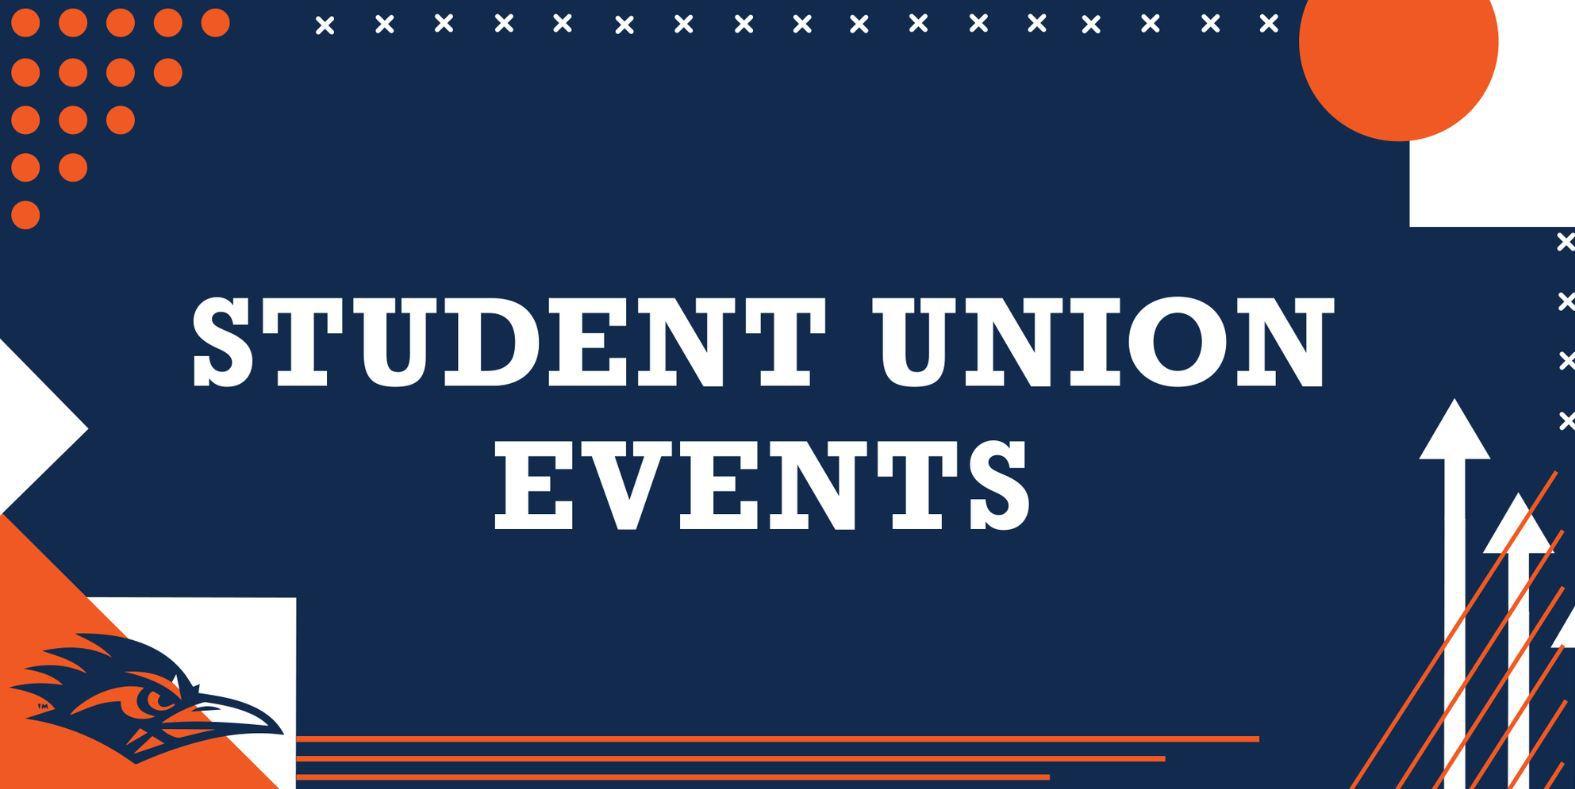 Student Union Events at UTSA